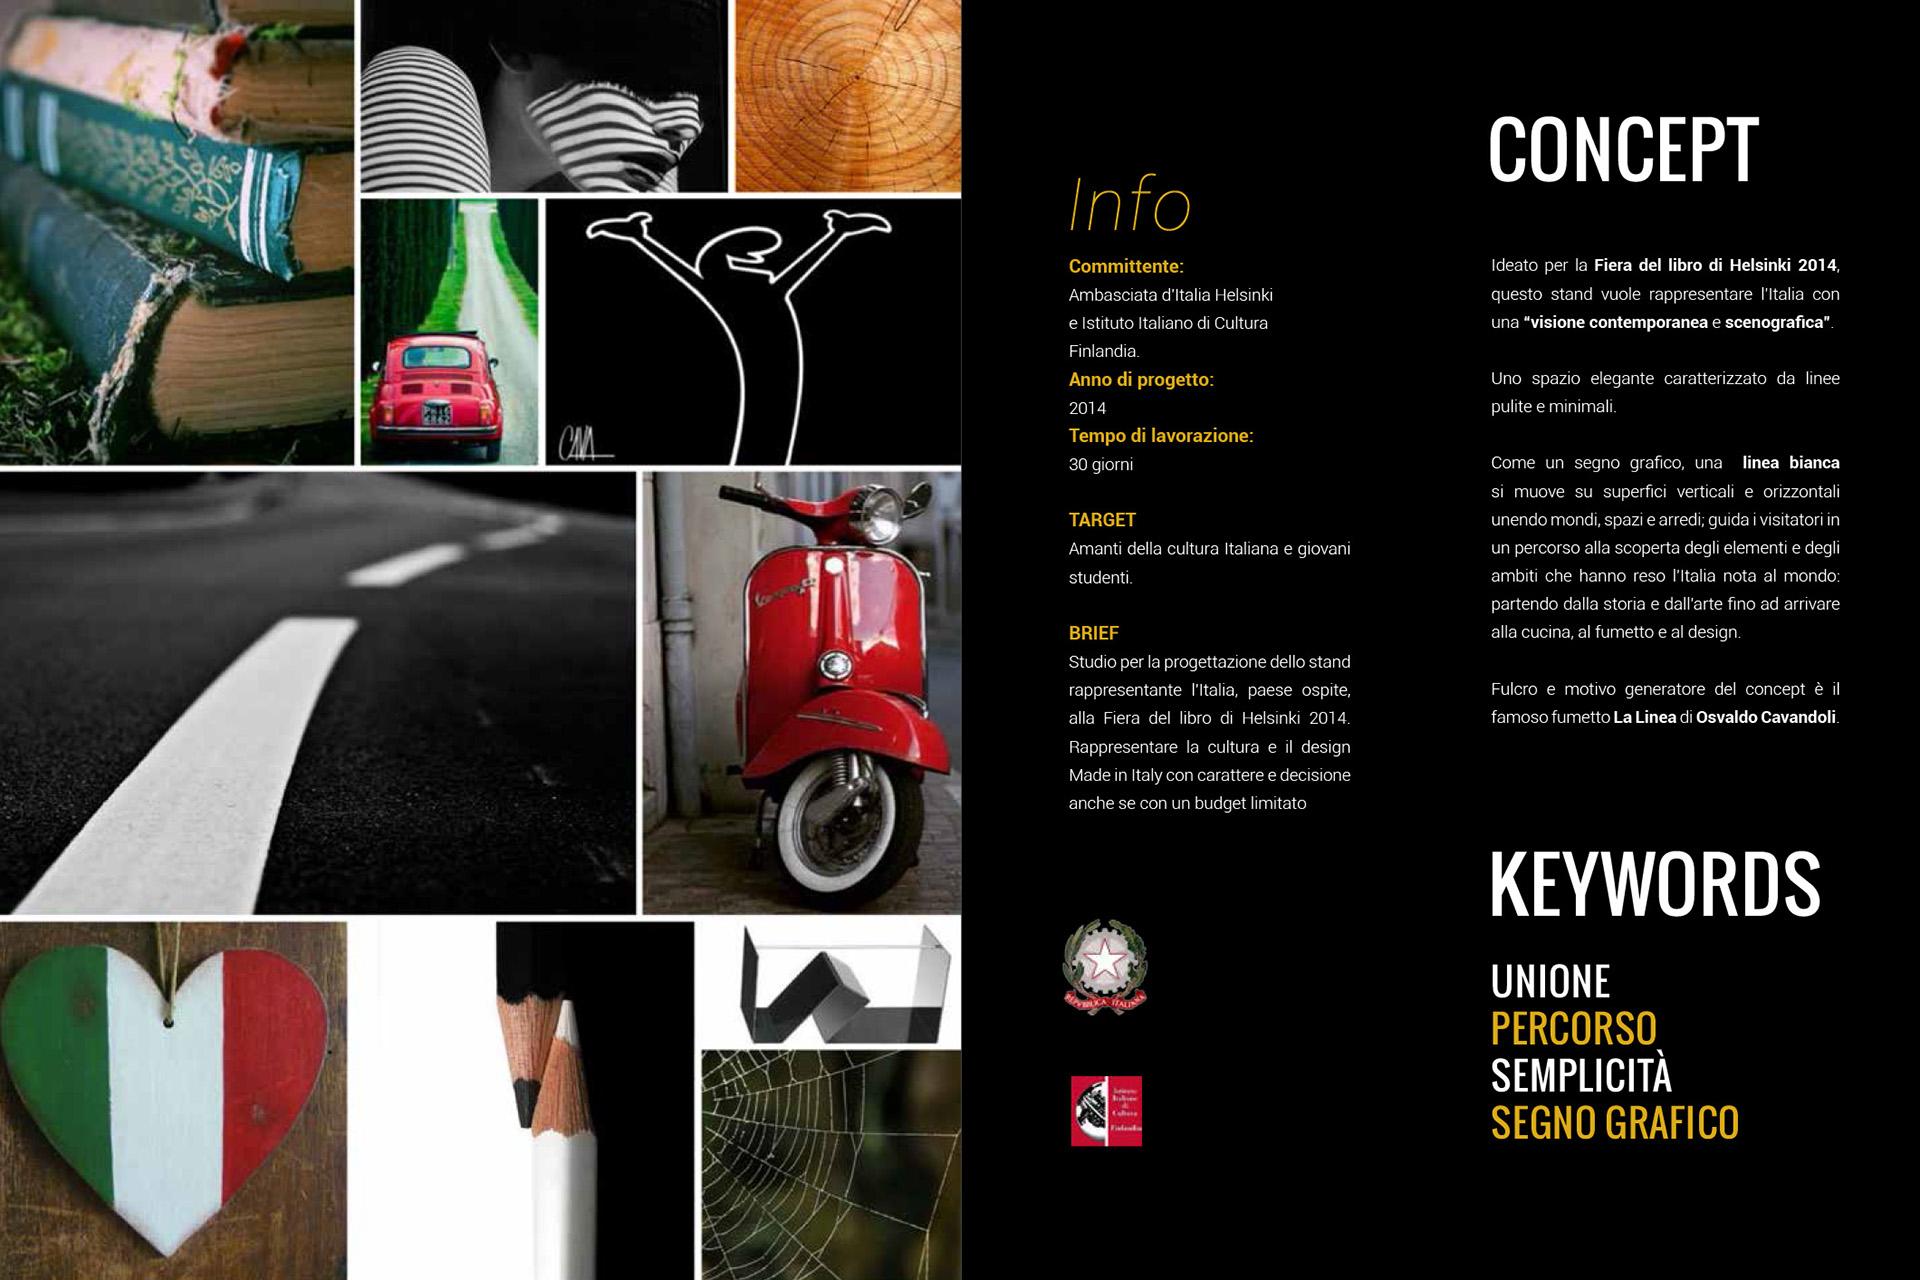 Cucina Con Finestra Orizzontale portfolio 2015 on behance